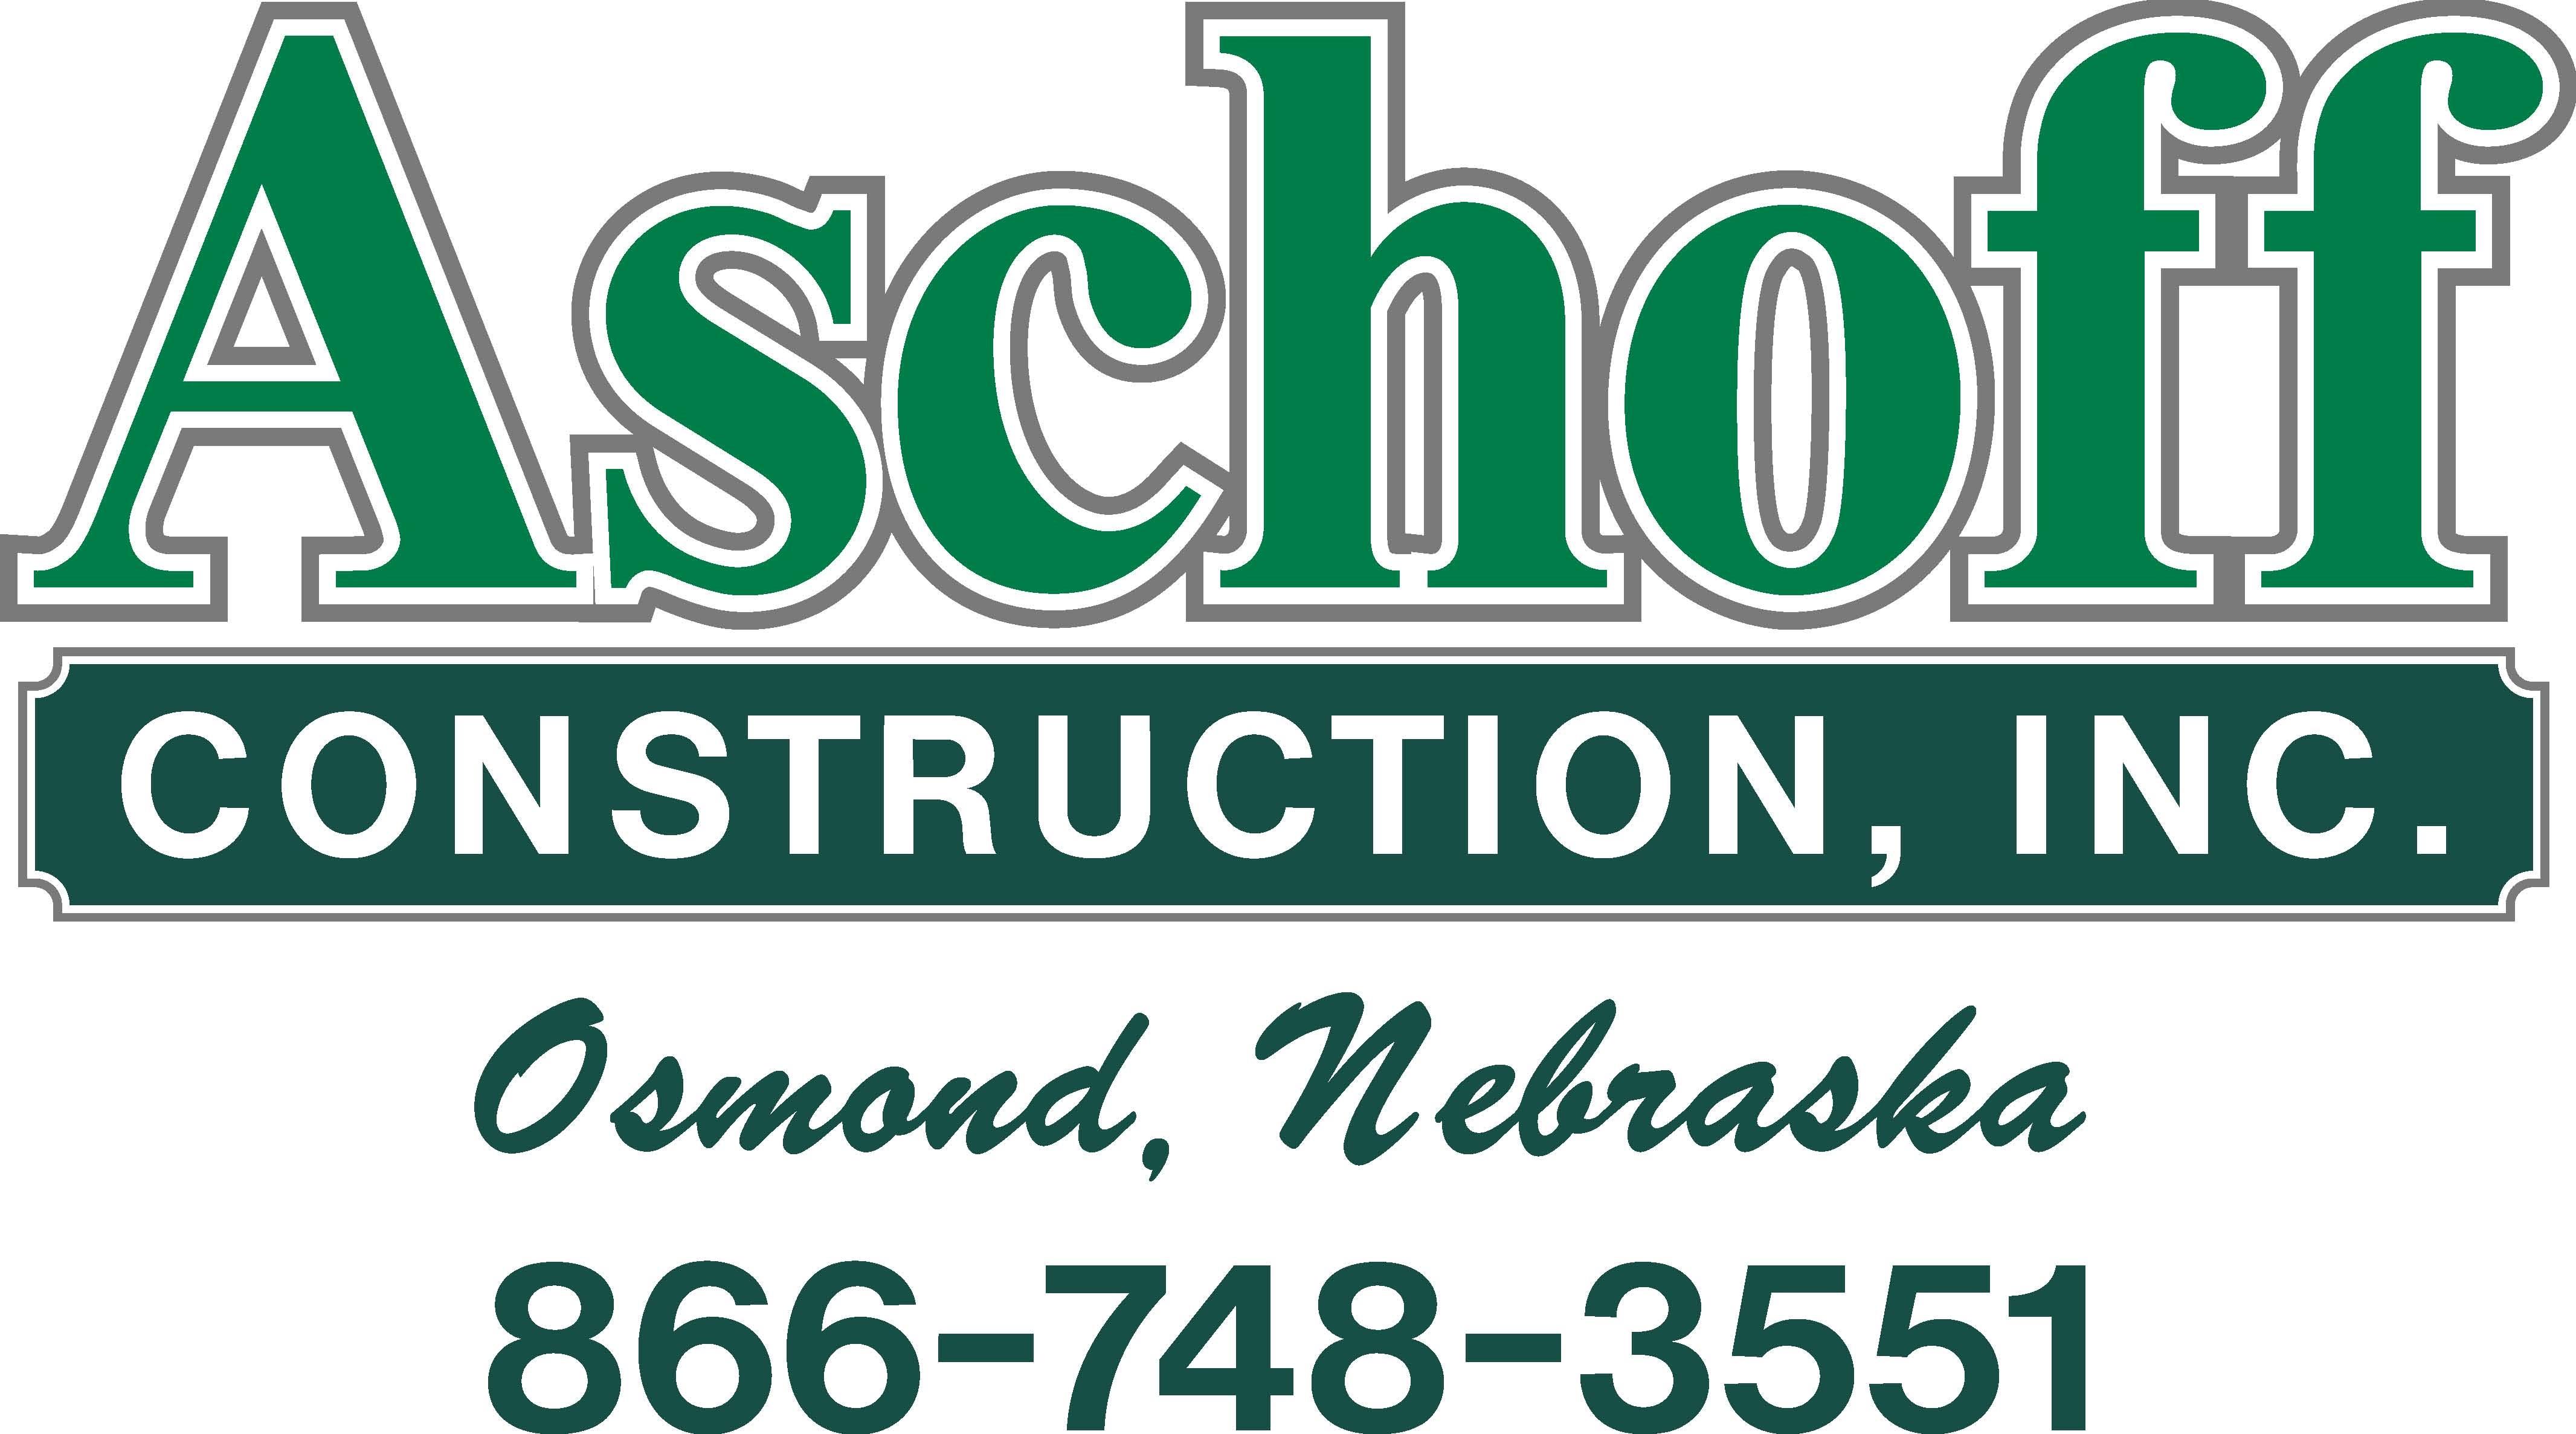 Aschoff logo